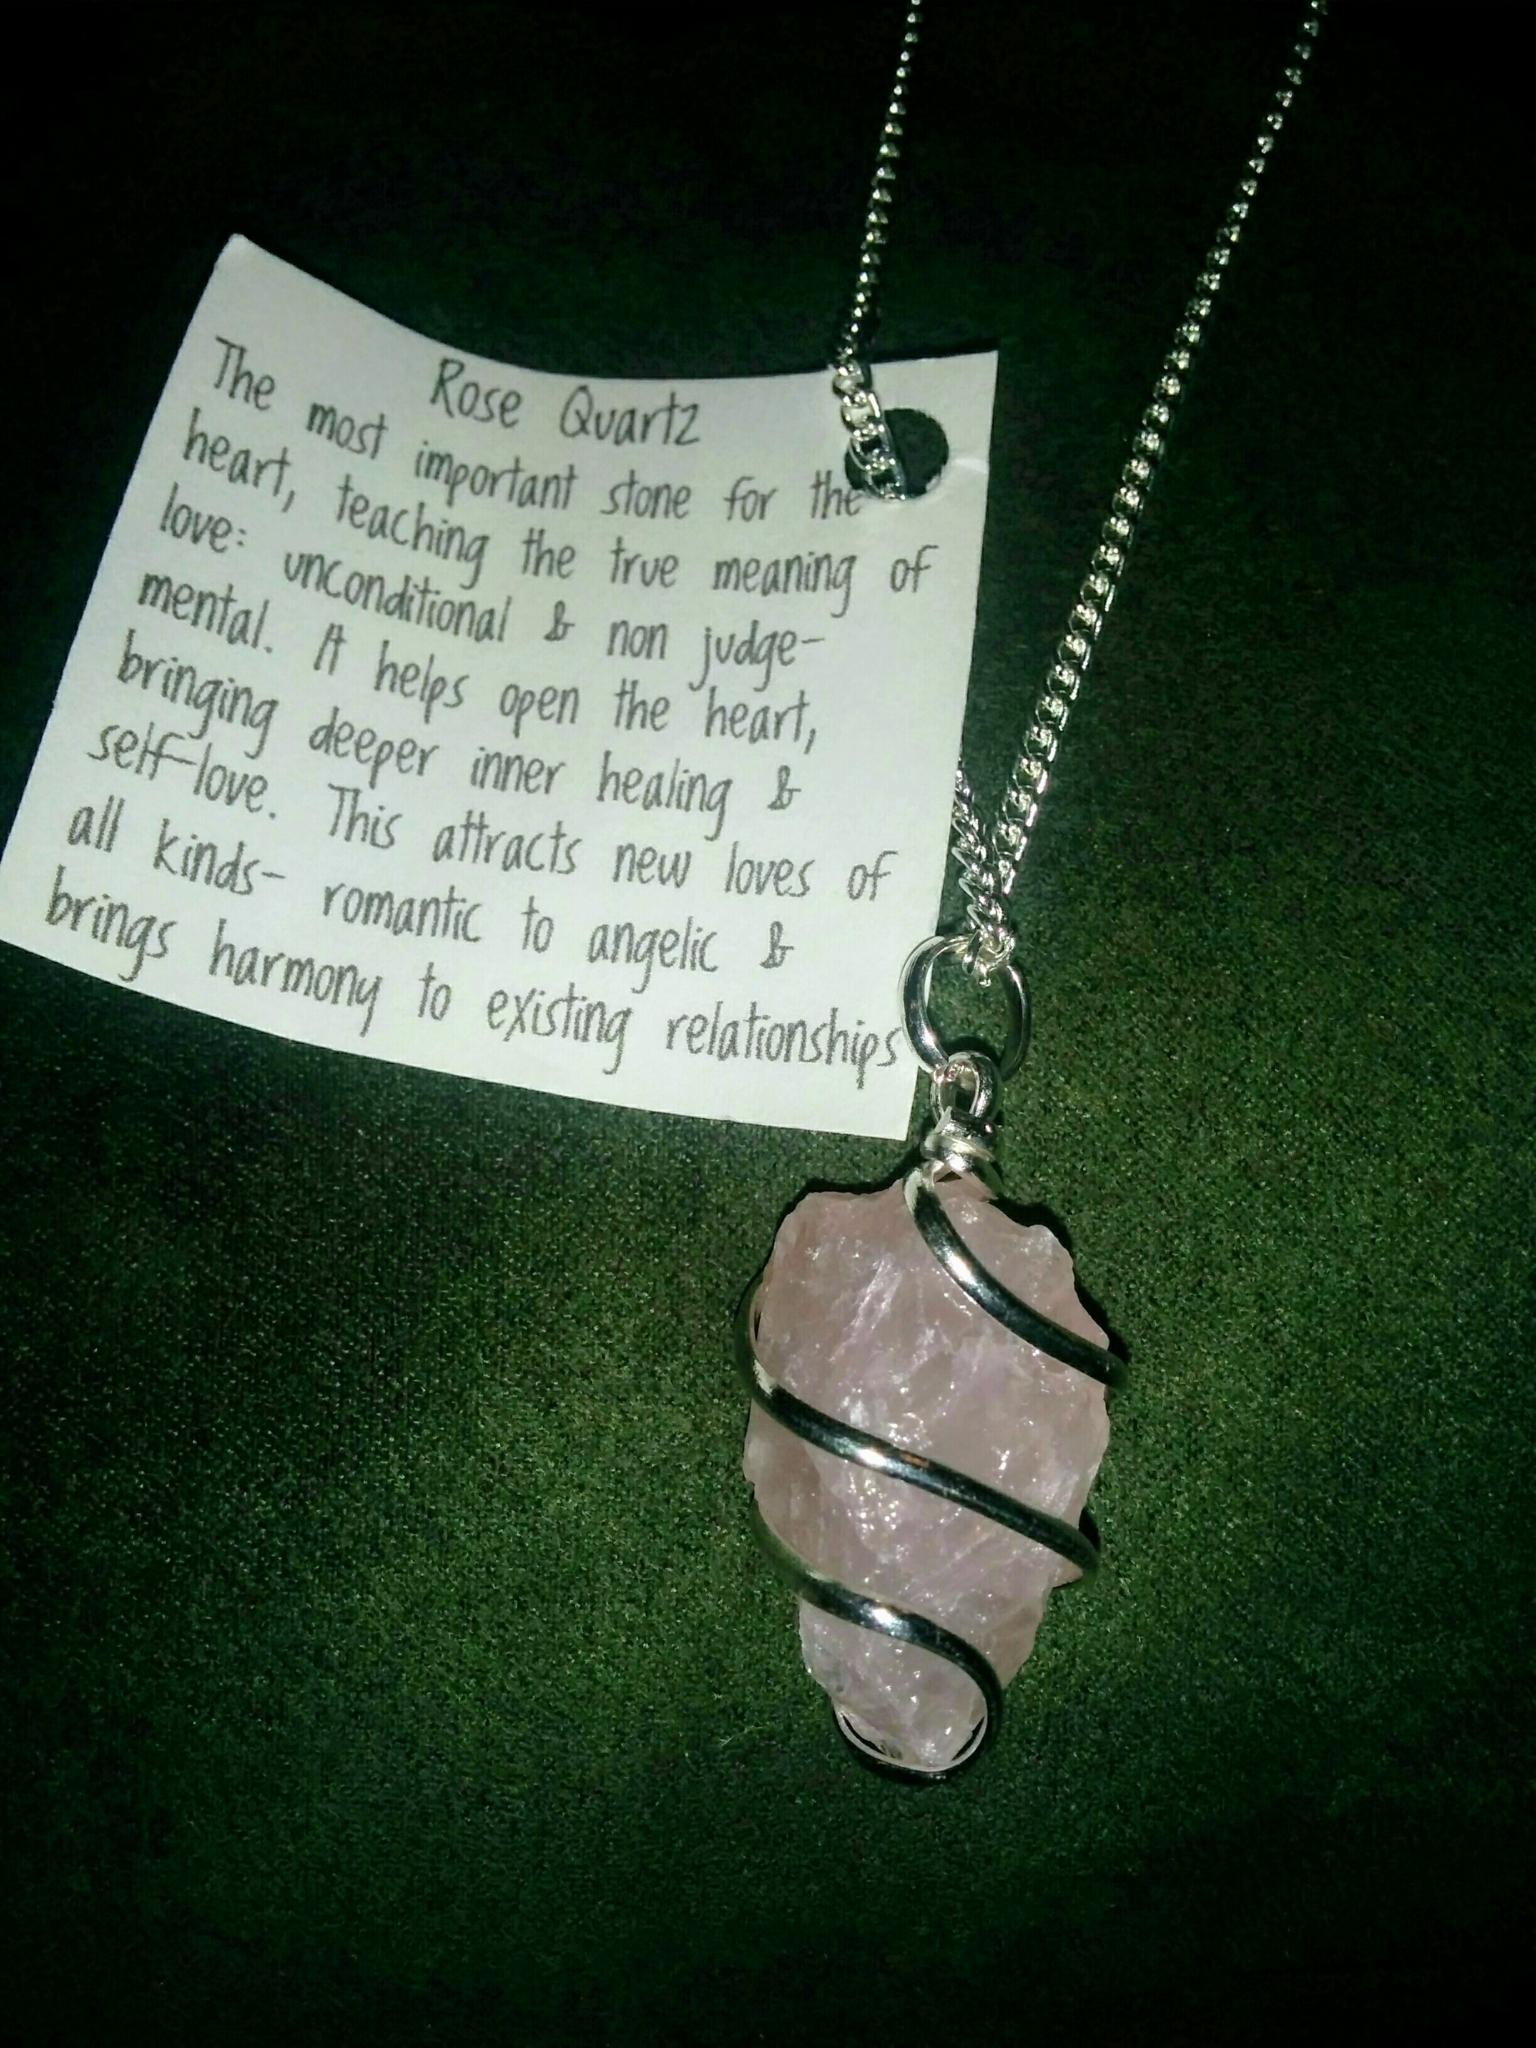 Brassy Lassy Inc in St John's: Rose quartz (love stone) wire wrapped on sterling, $20